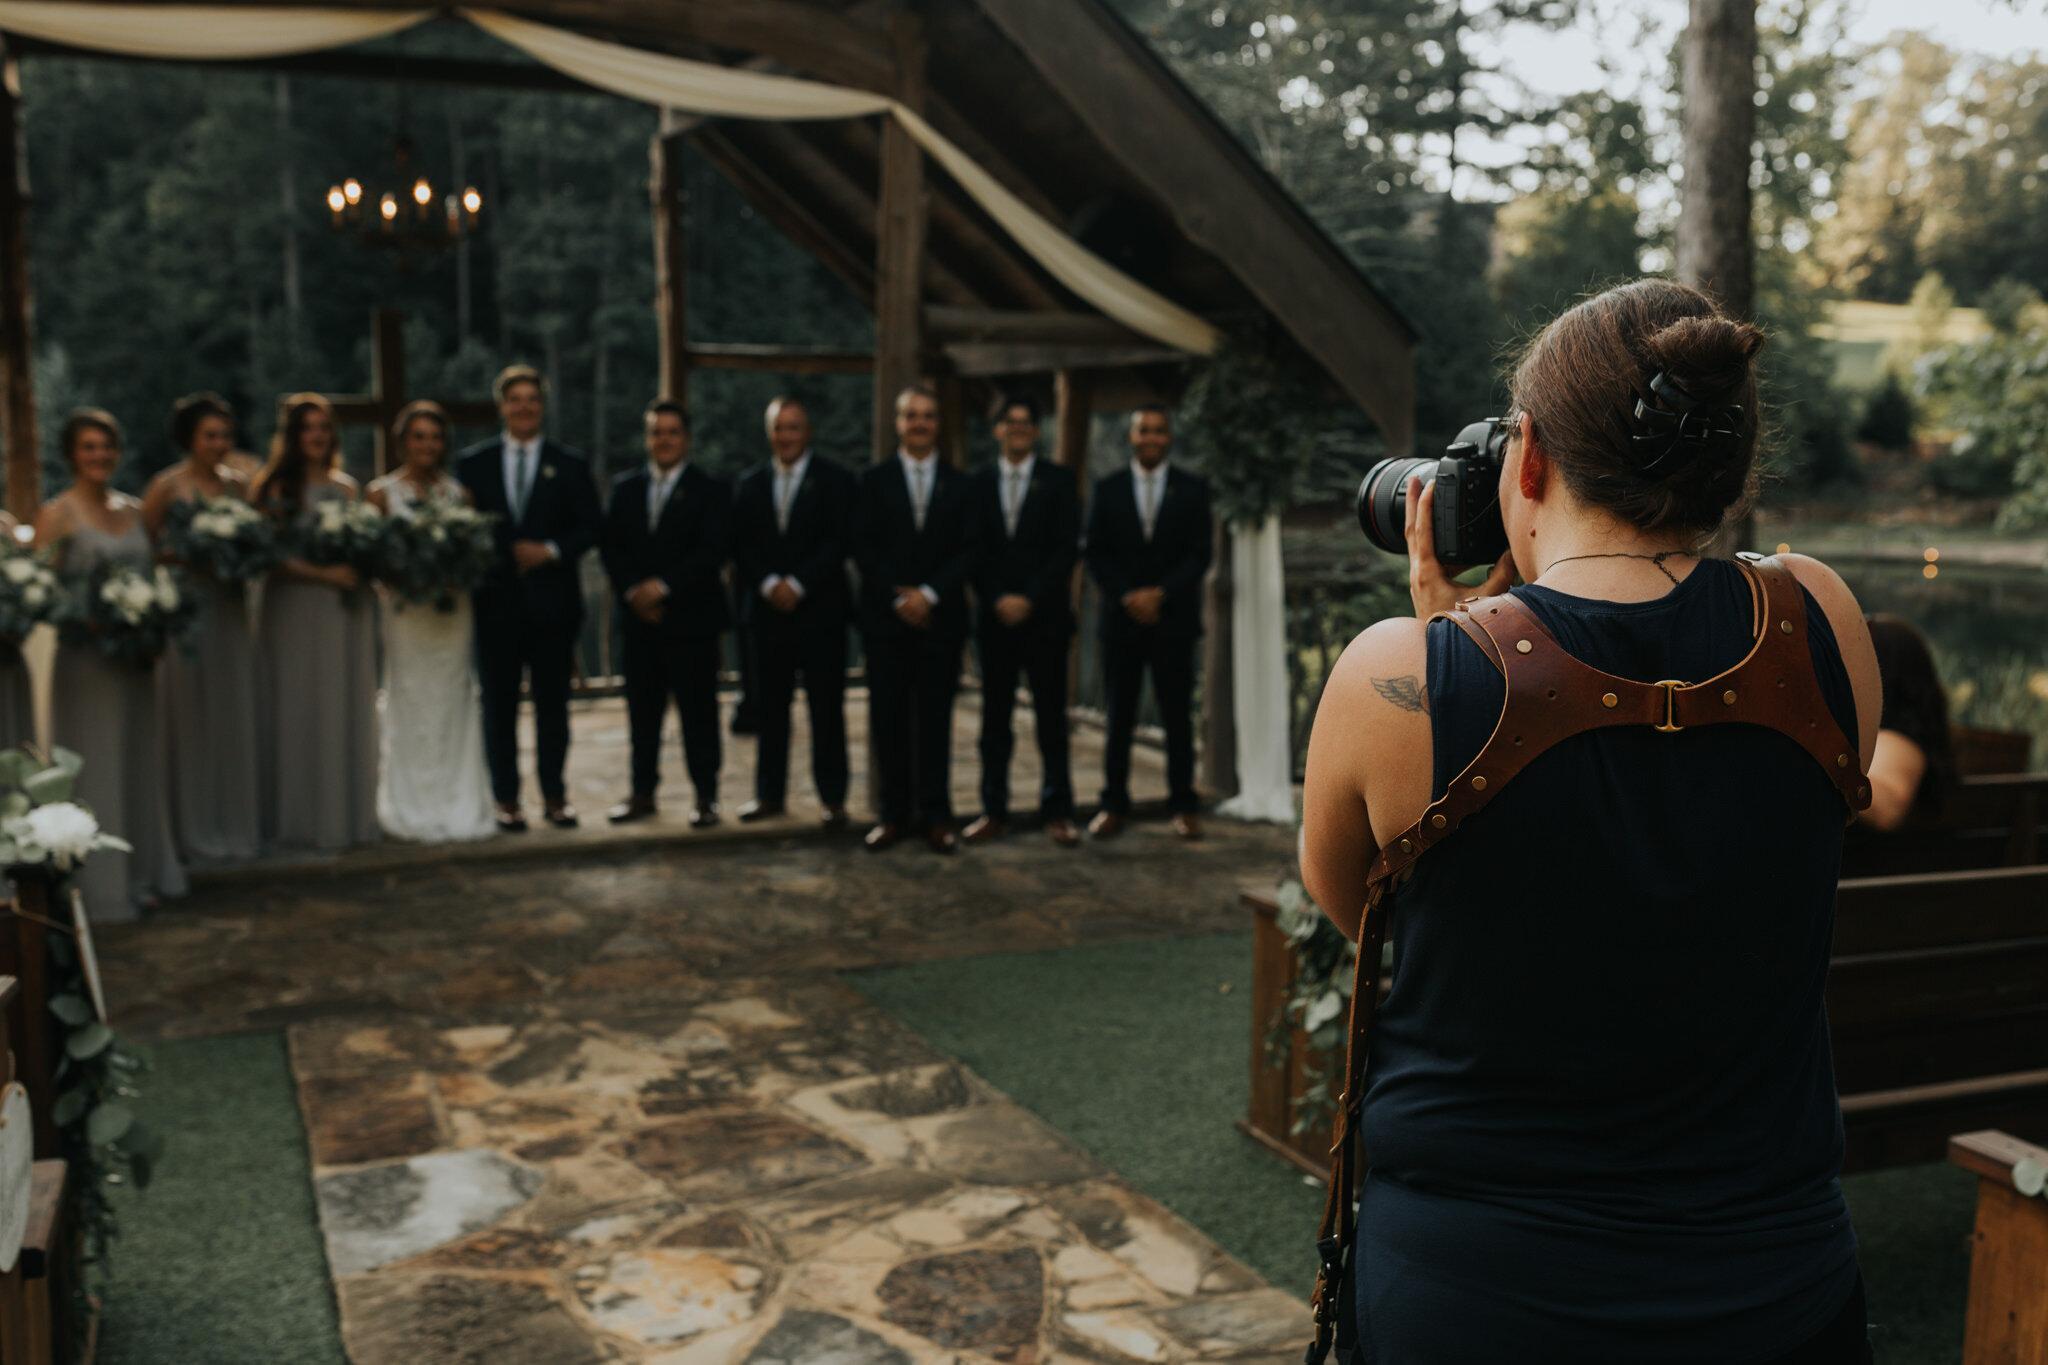 North-Carolina-Wedding-Photographer-1.jpg